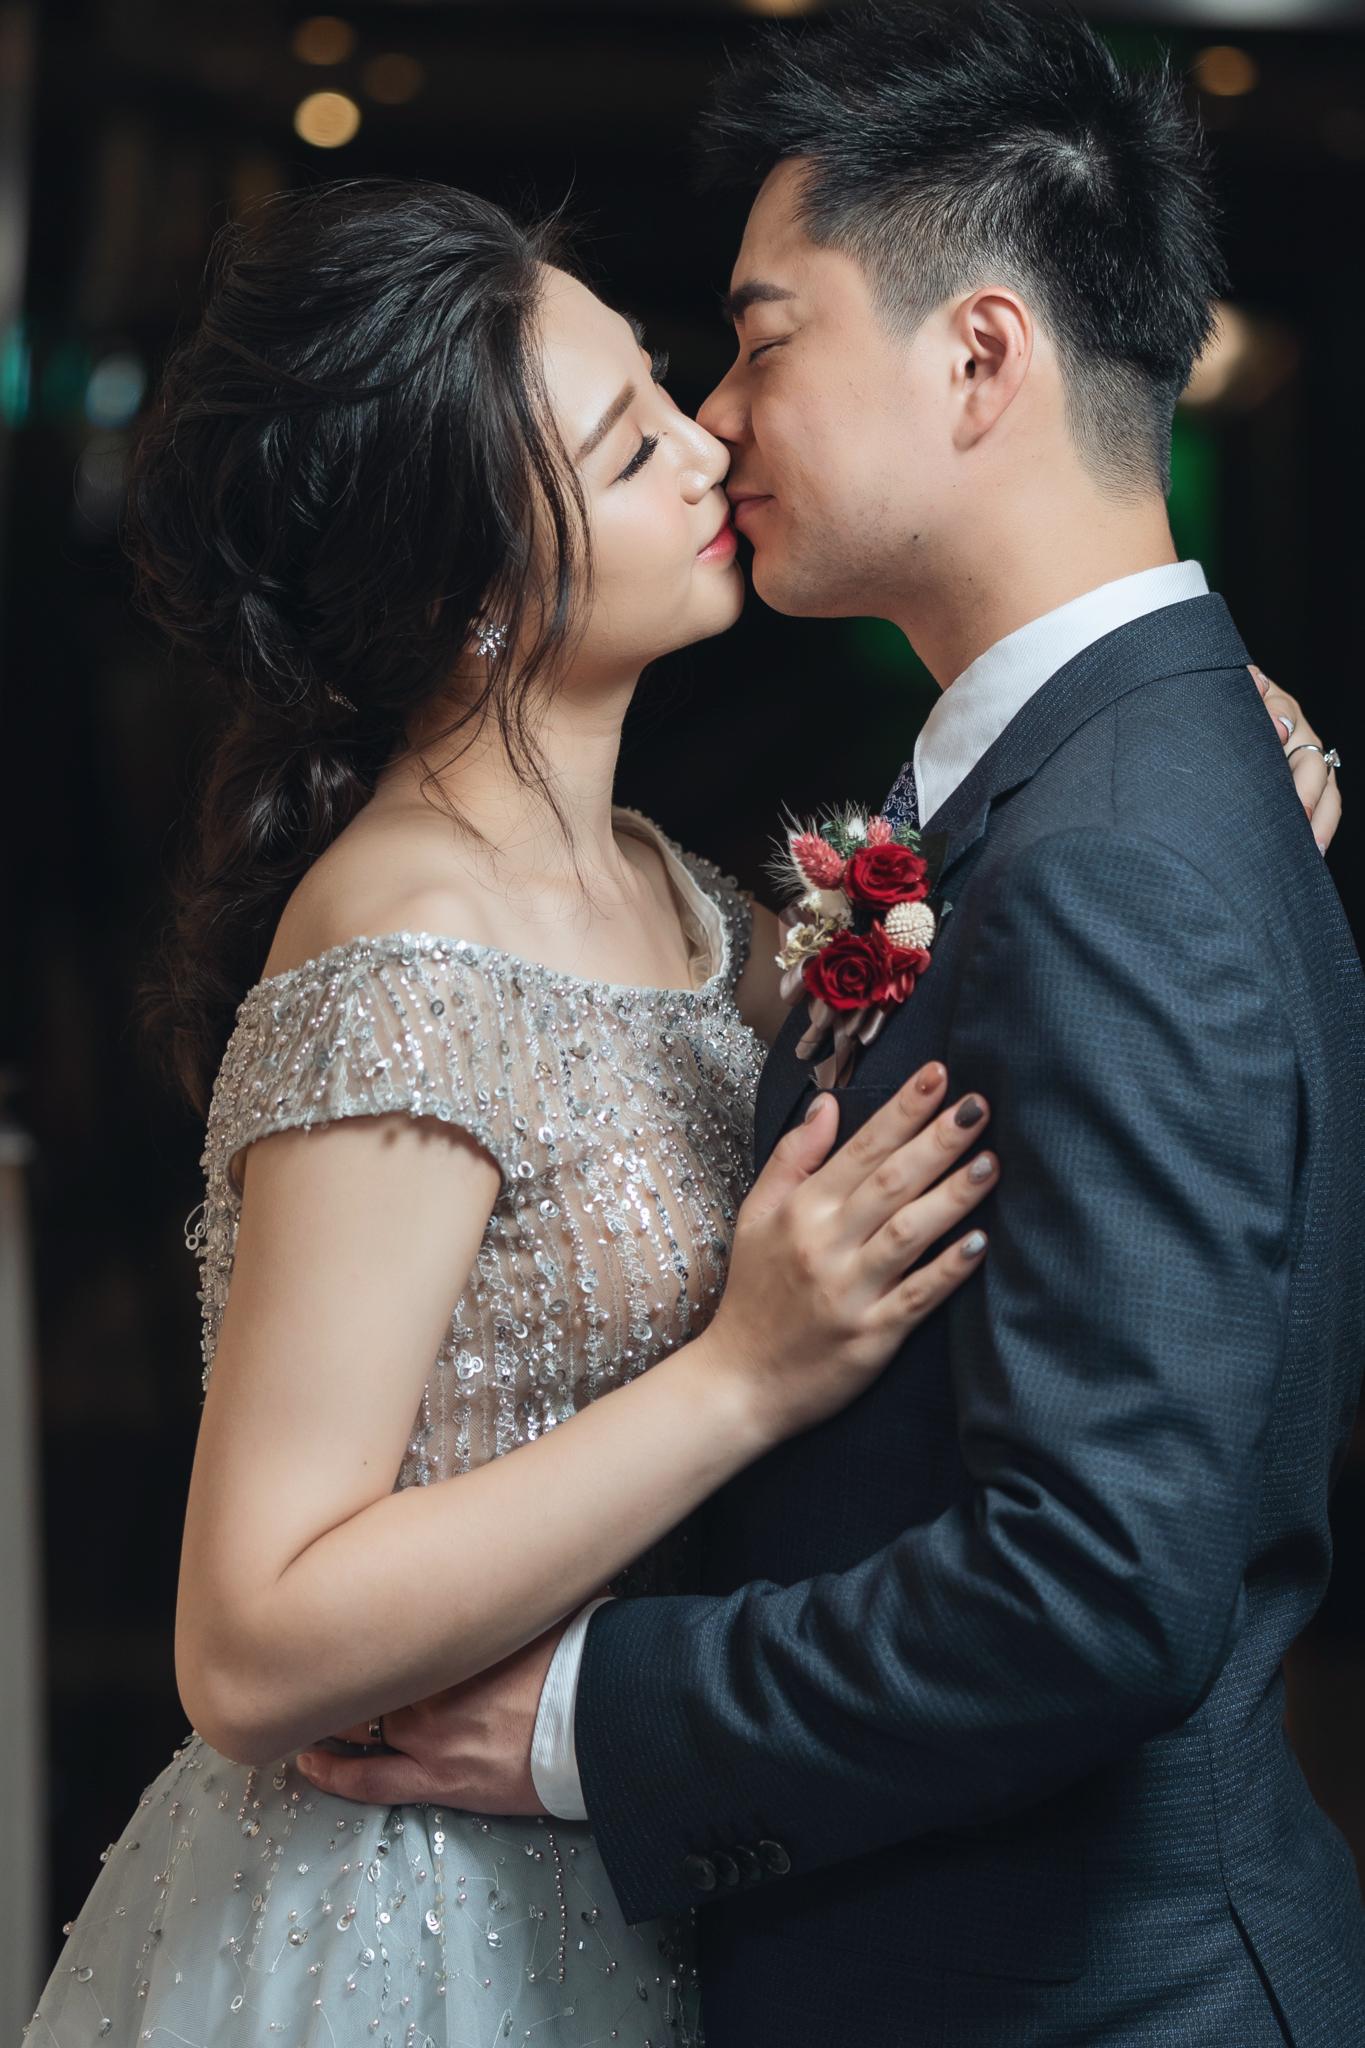 Donfer, EASTERN WEDDING, 晶華酒店, 婚禮紀錄, Wedding Day, Sony